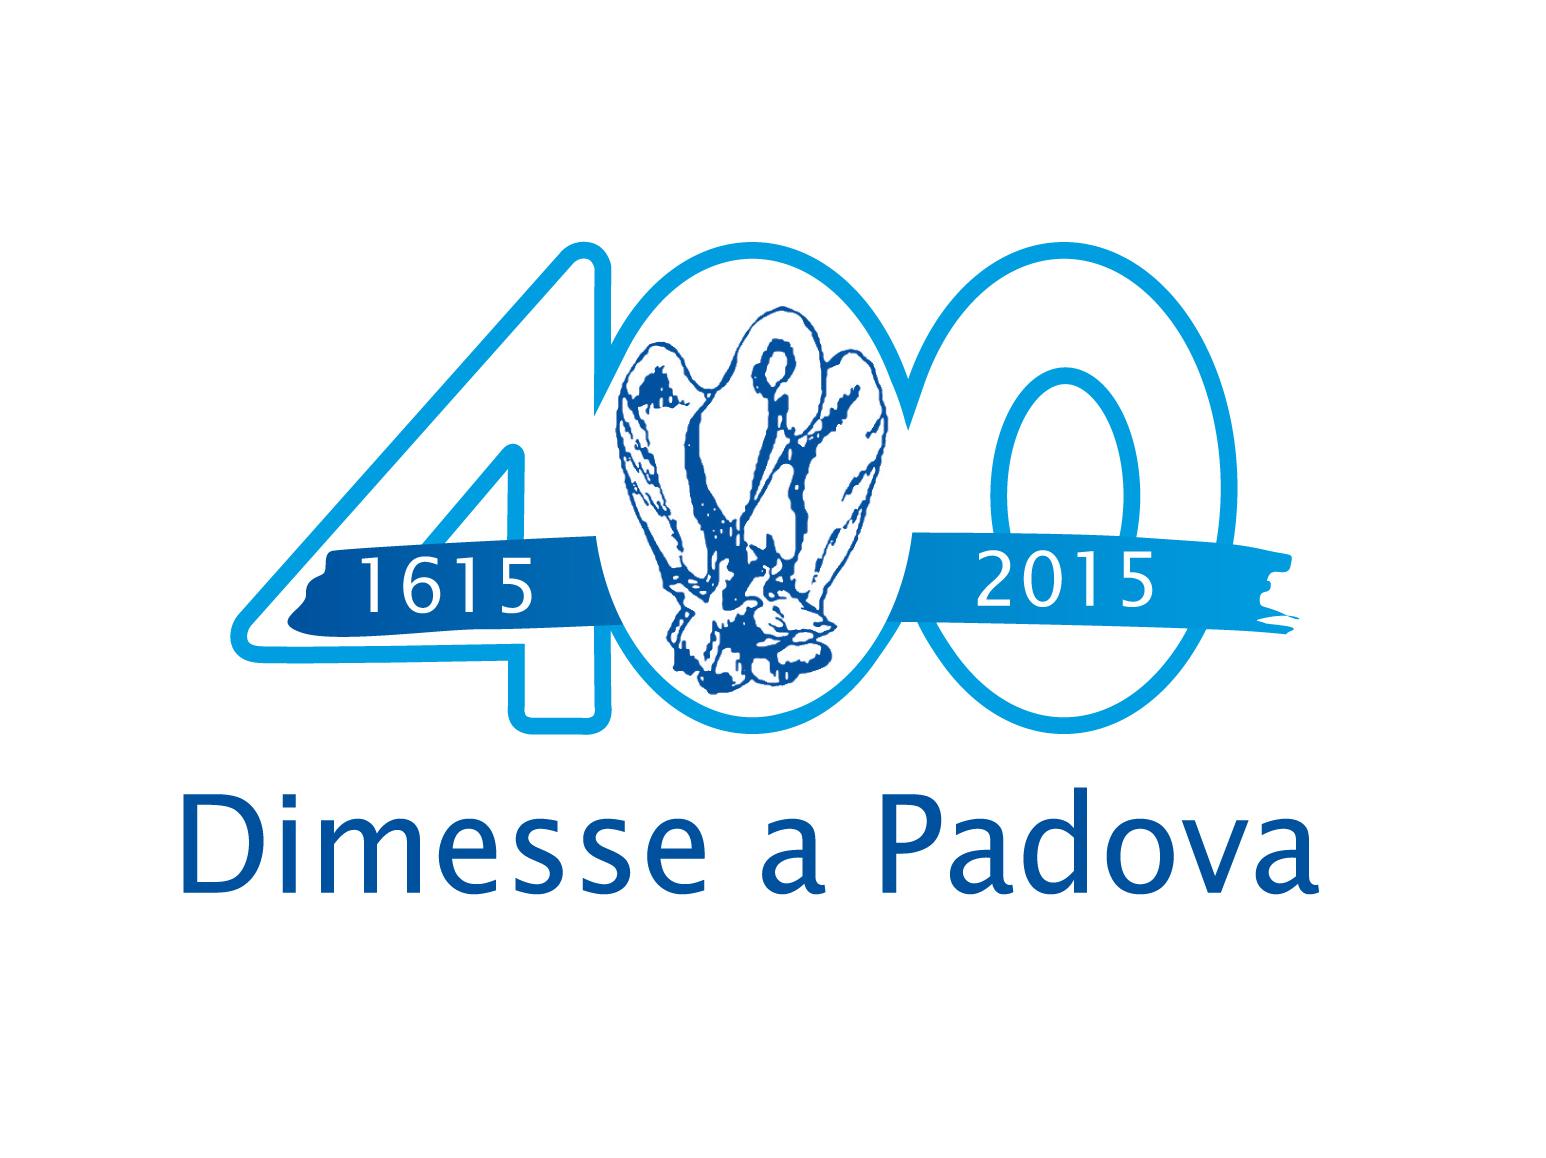 DIMESSE PADOVA